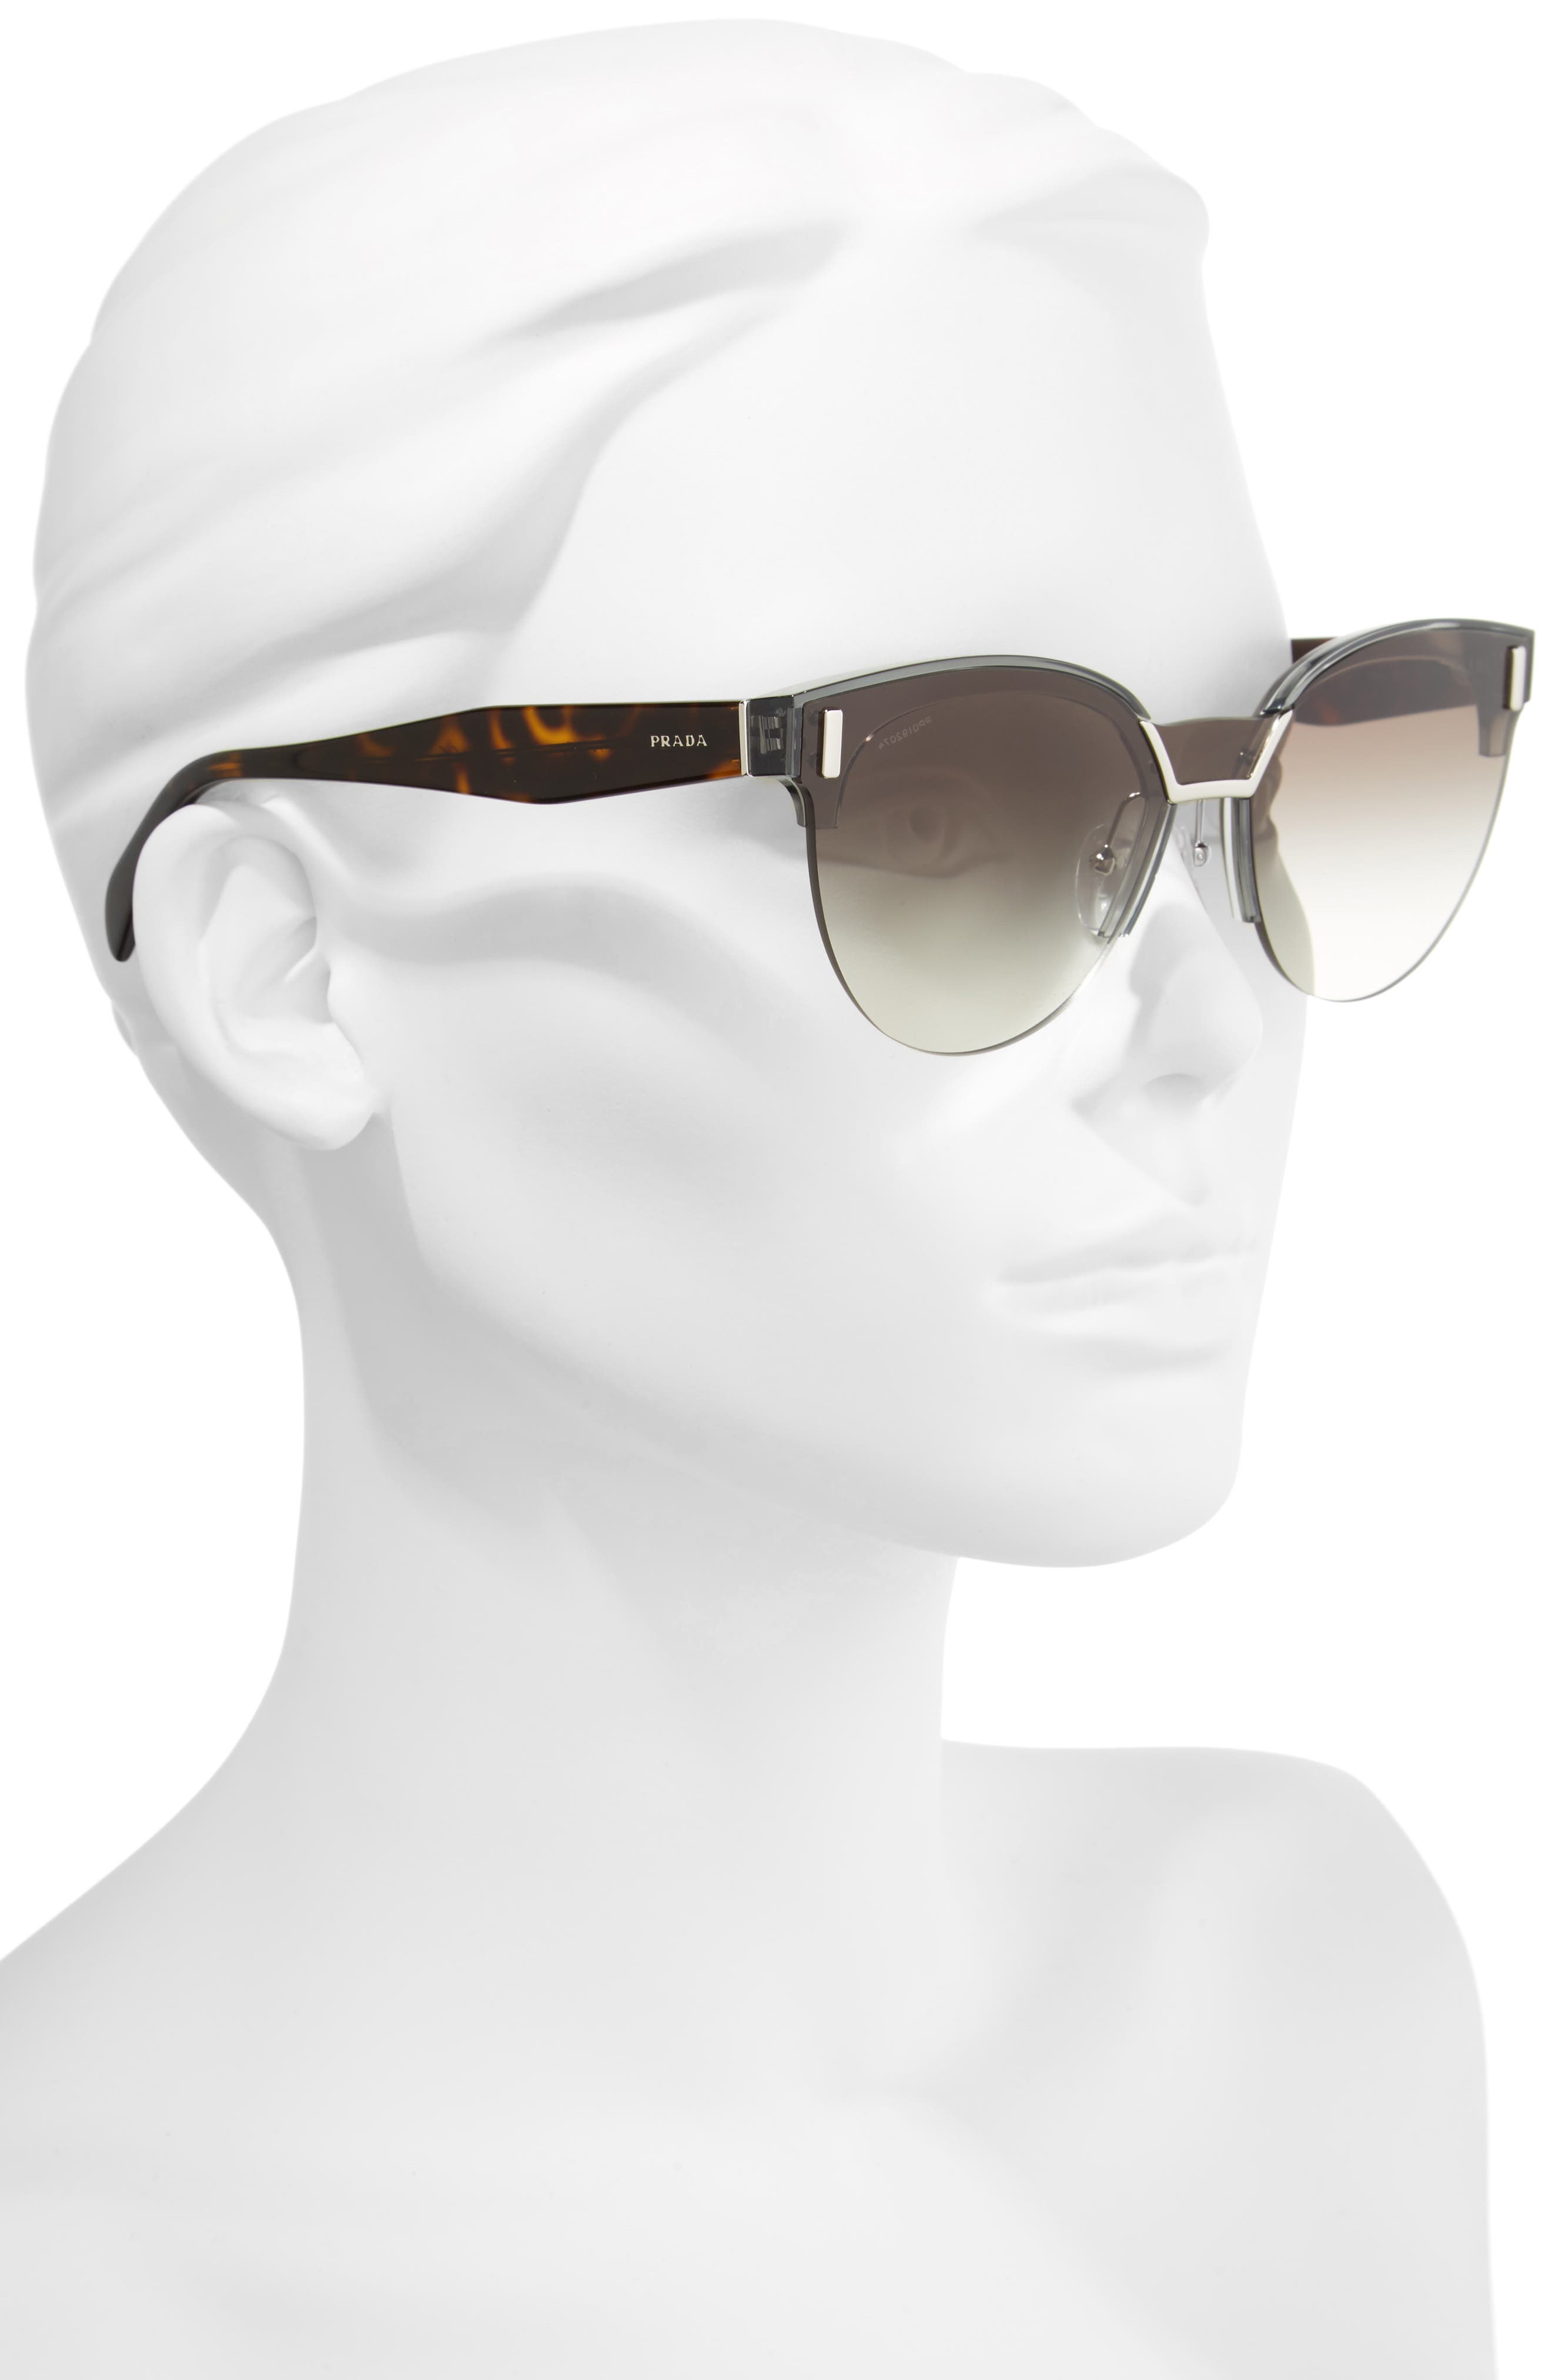 50mm Semi Rimless Gradient Sunglasses,                             Alternate thumbnail 2, color,                             Grey Gradient